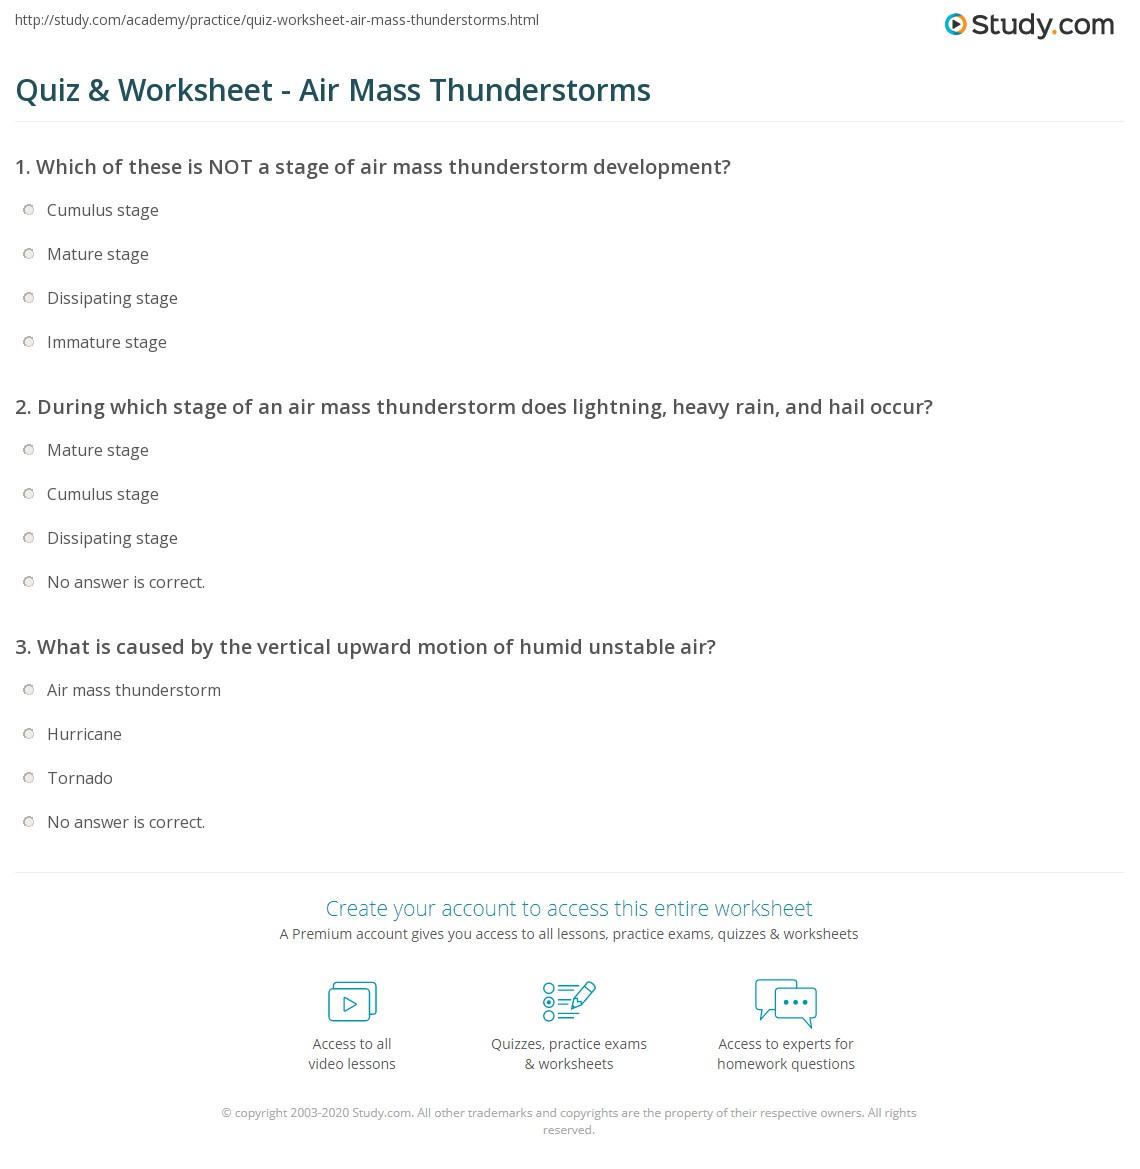 Free Worksheet Child Support Worksheet Washington thunderstorm worksheets delibertad quiz worksheet air mass thunderstorms study com